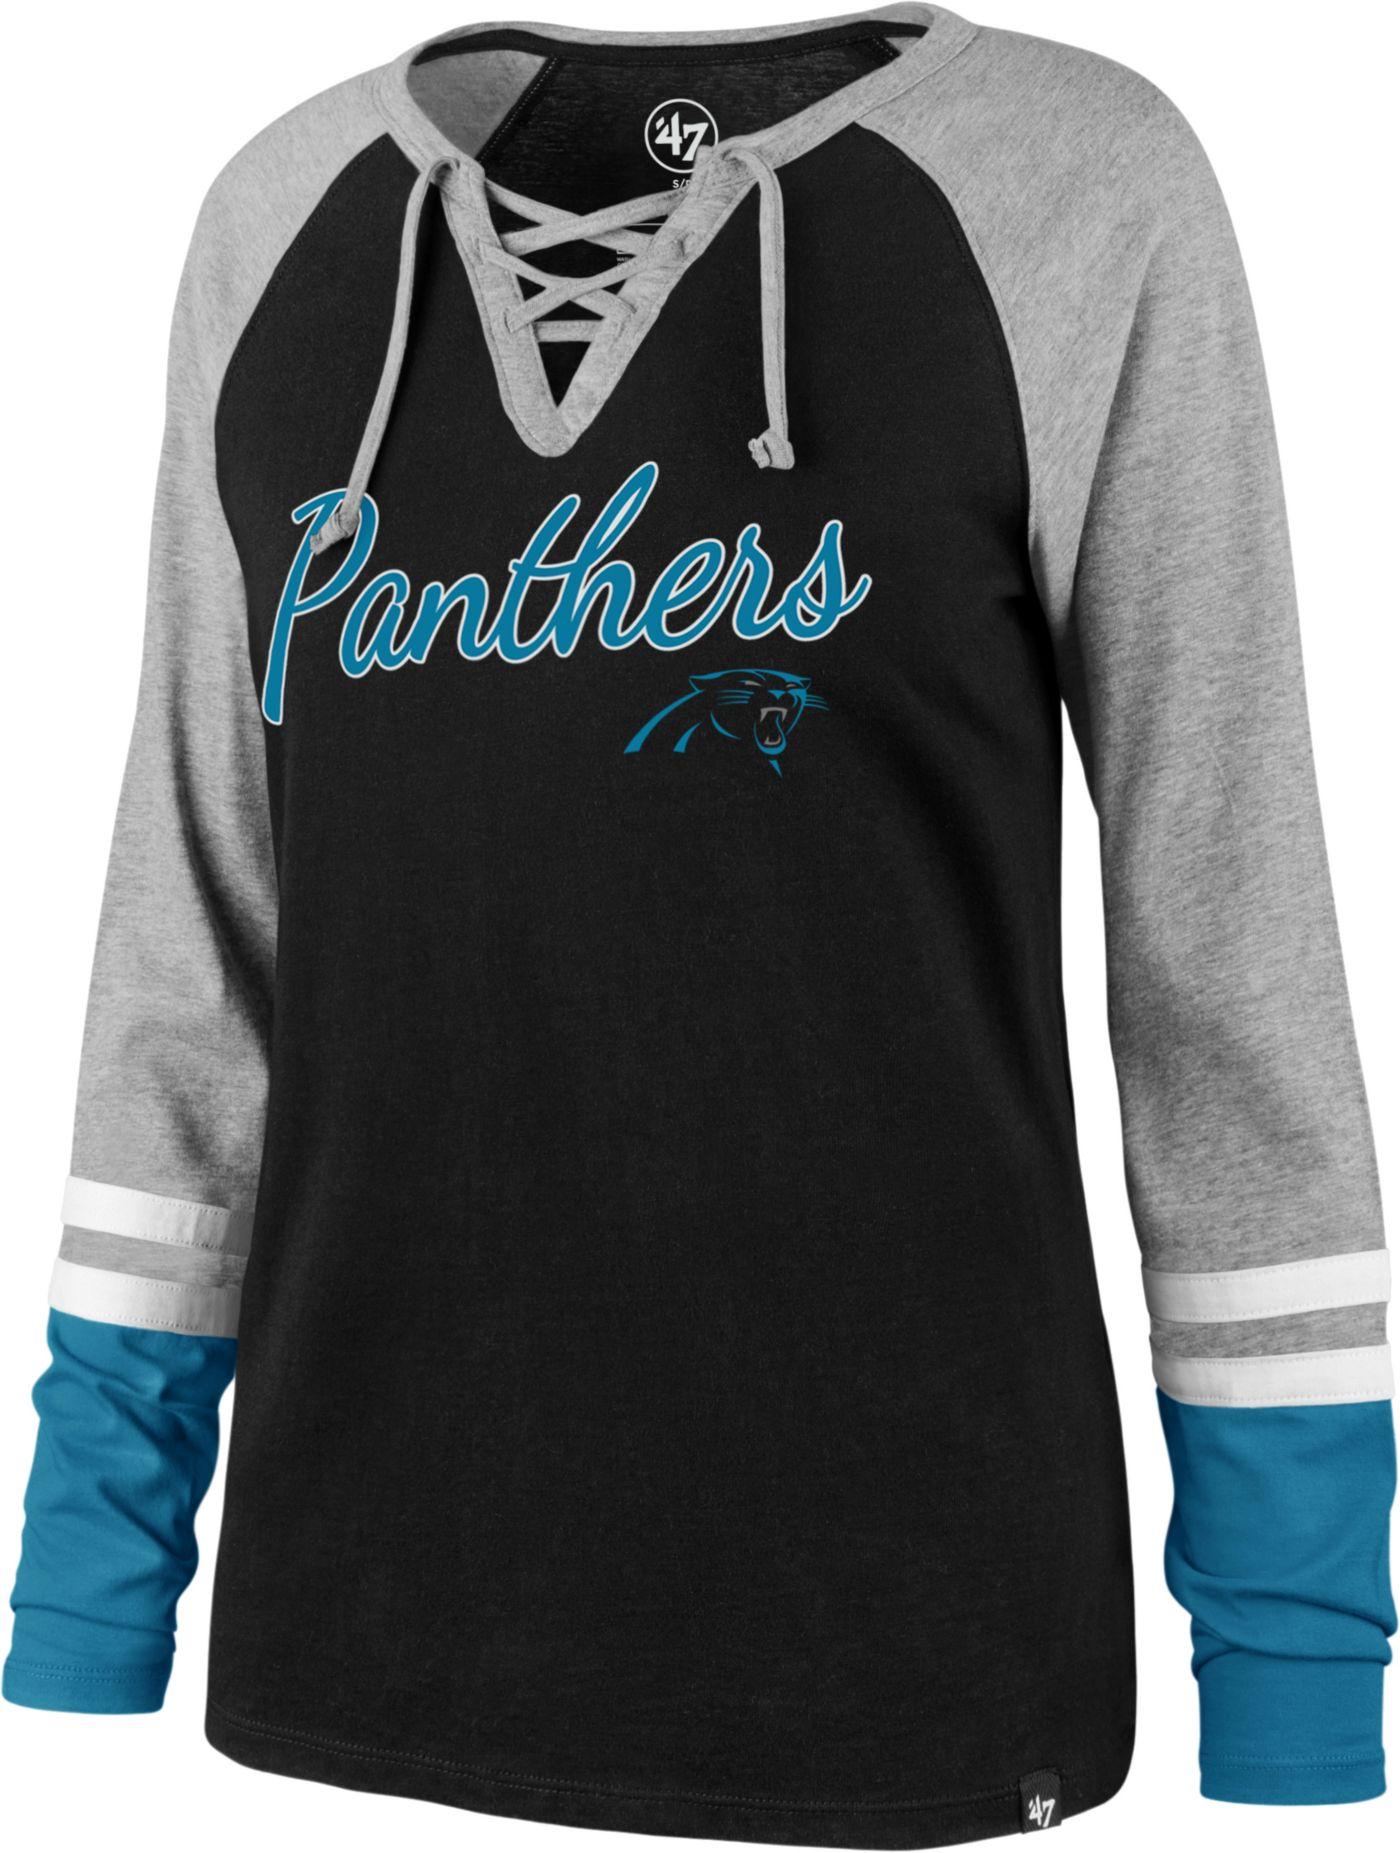 '47 Women's Carolina Panthers Fastbreak Lace-Up Long Sleeve Black Shirt